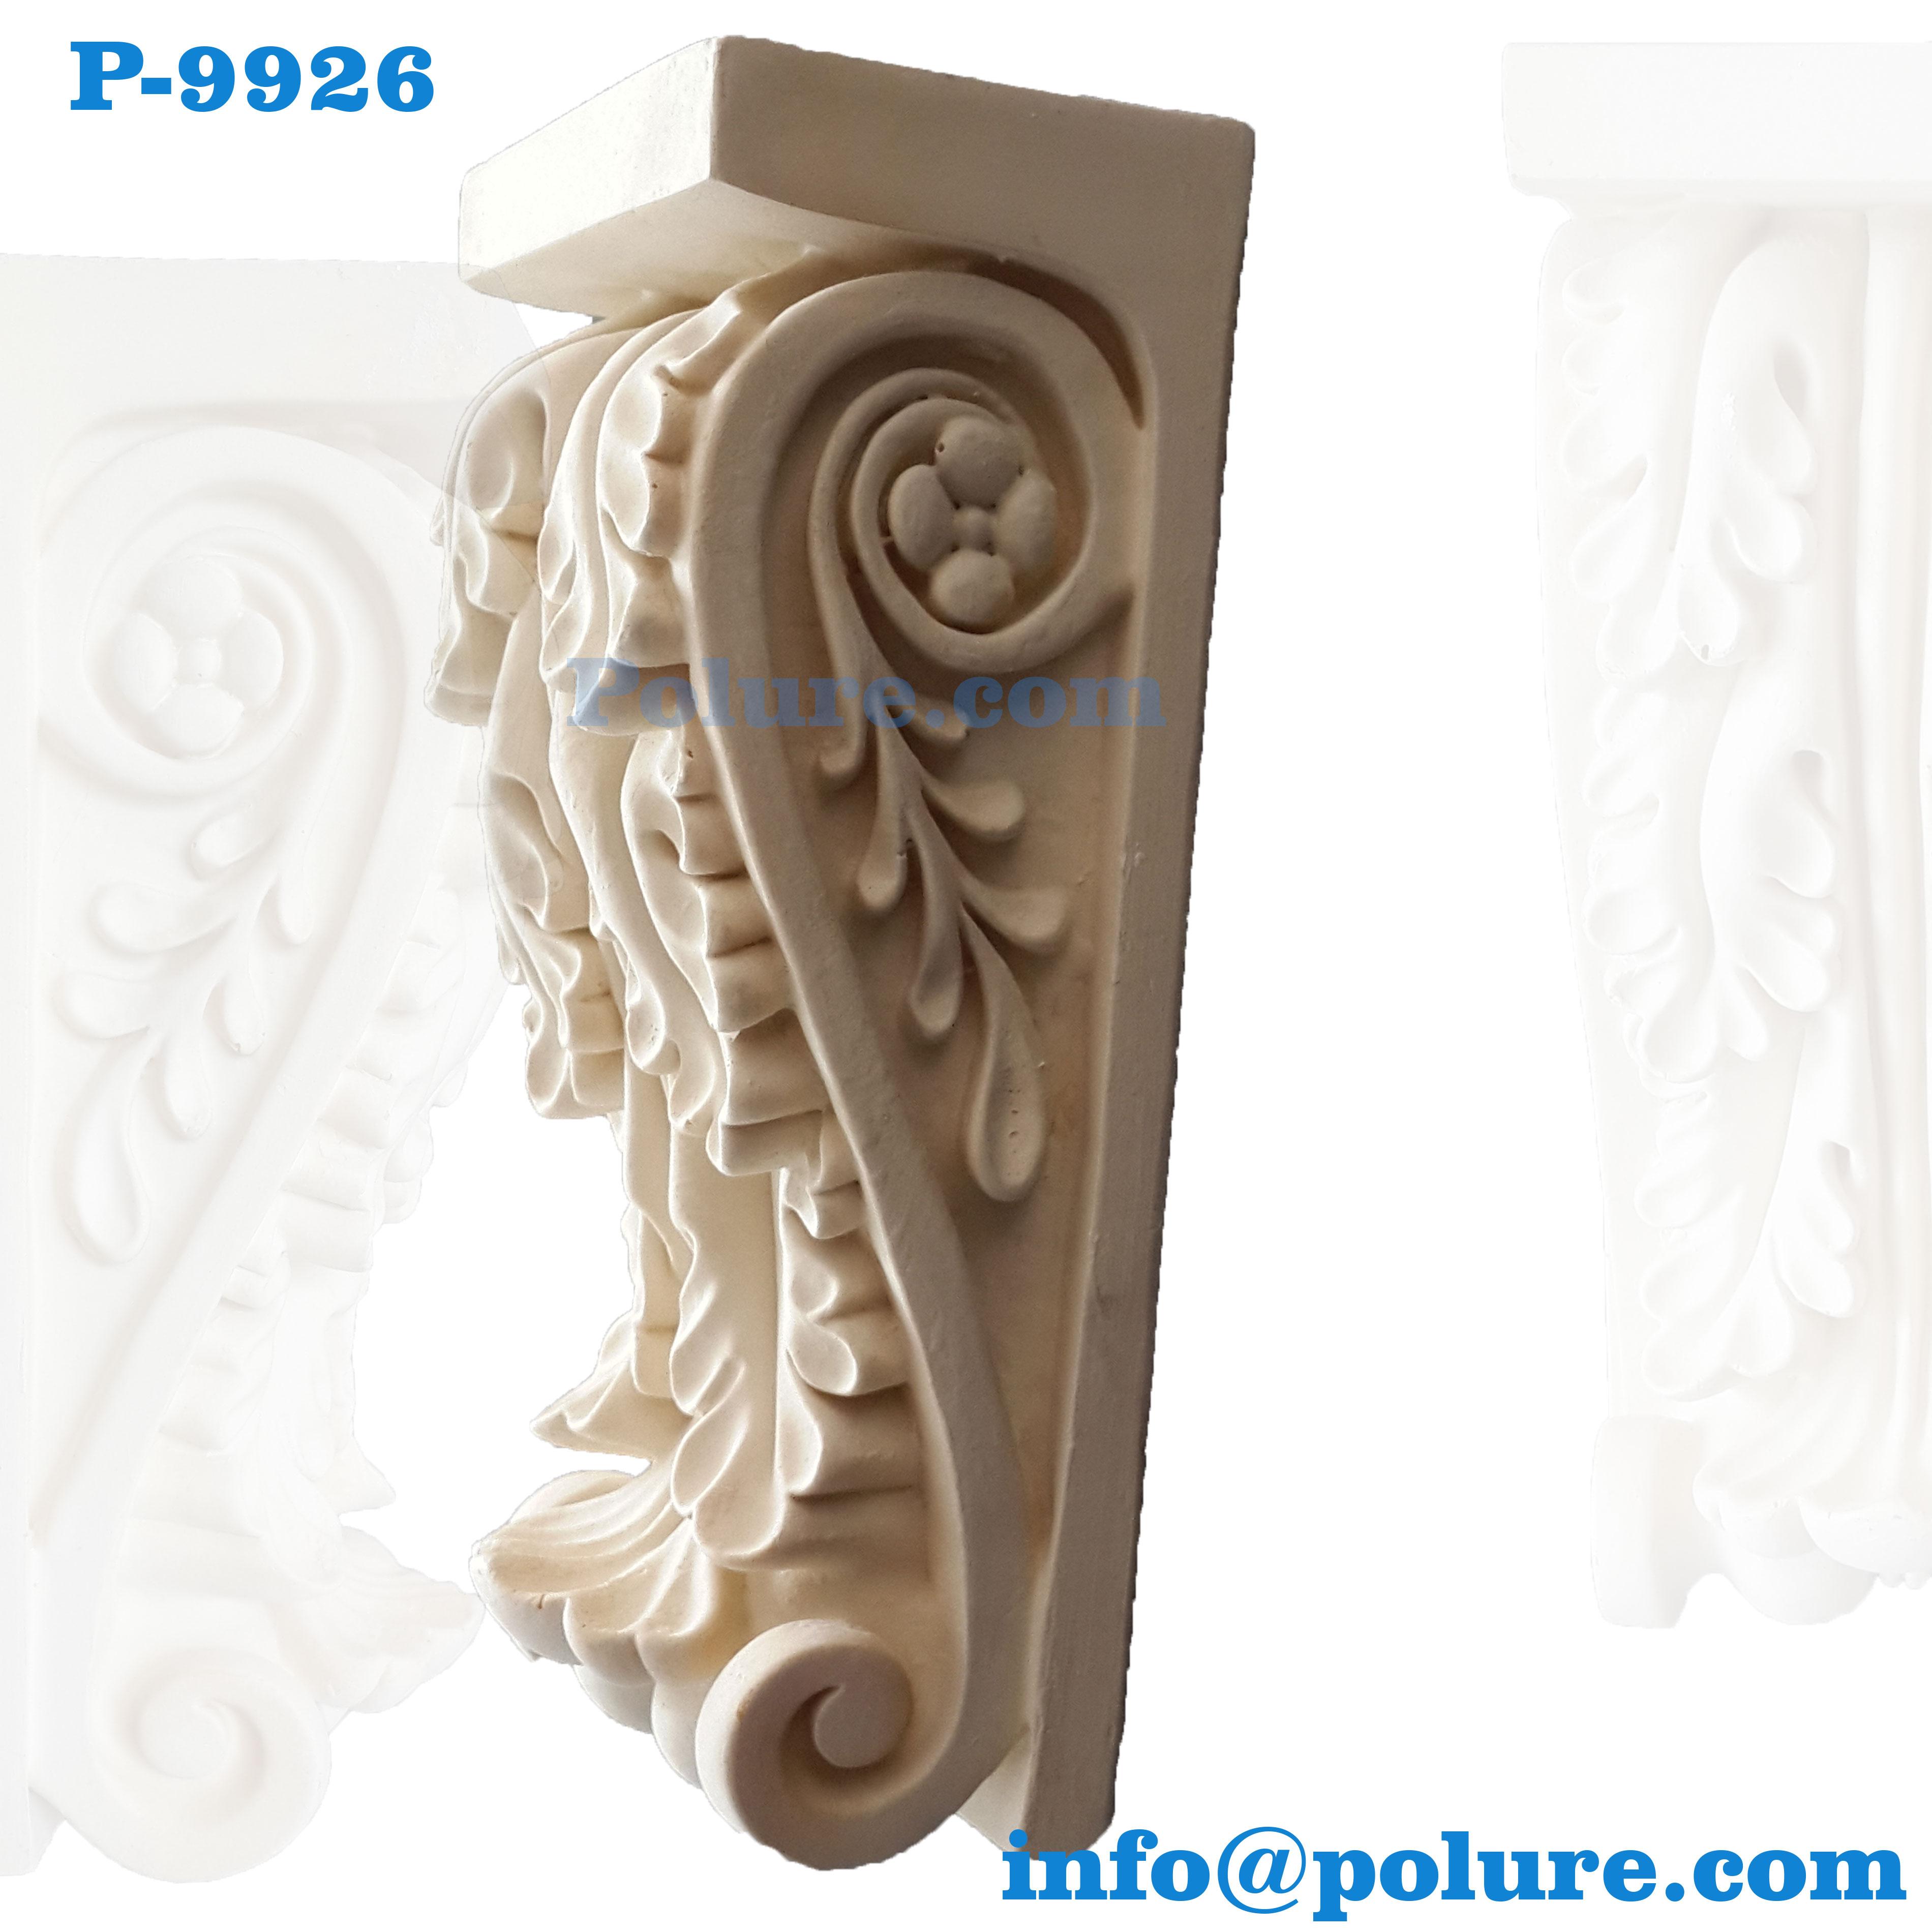 P-9926-polyurethane-decorative-corbel-leaf-foam-moulding-pu-price-decoration-exterior (5)